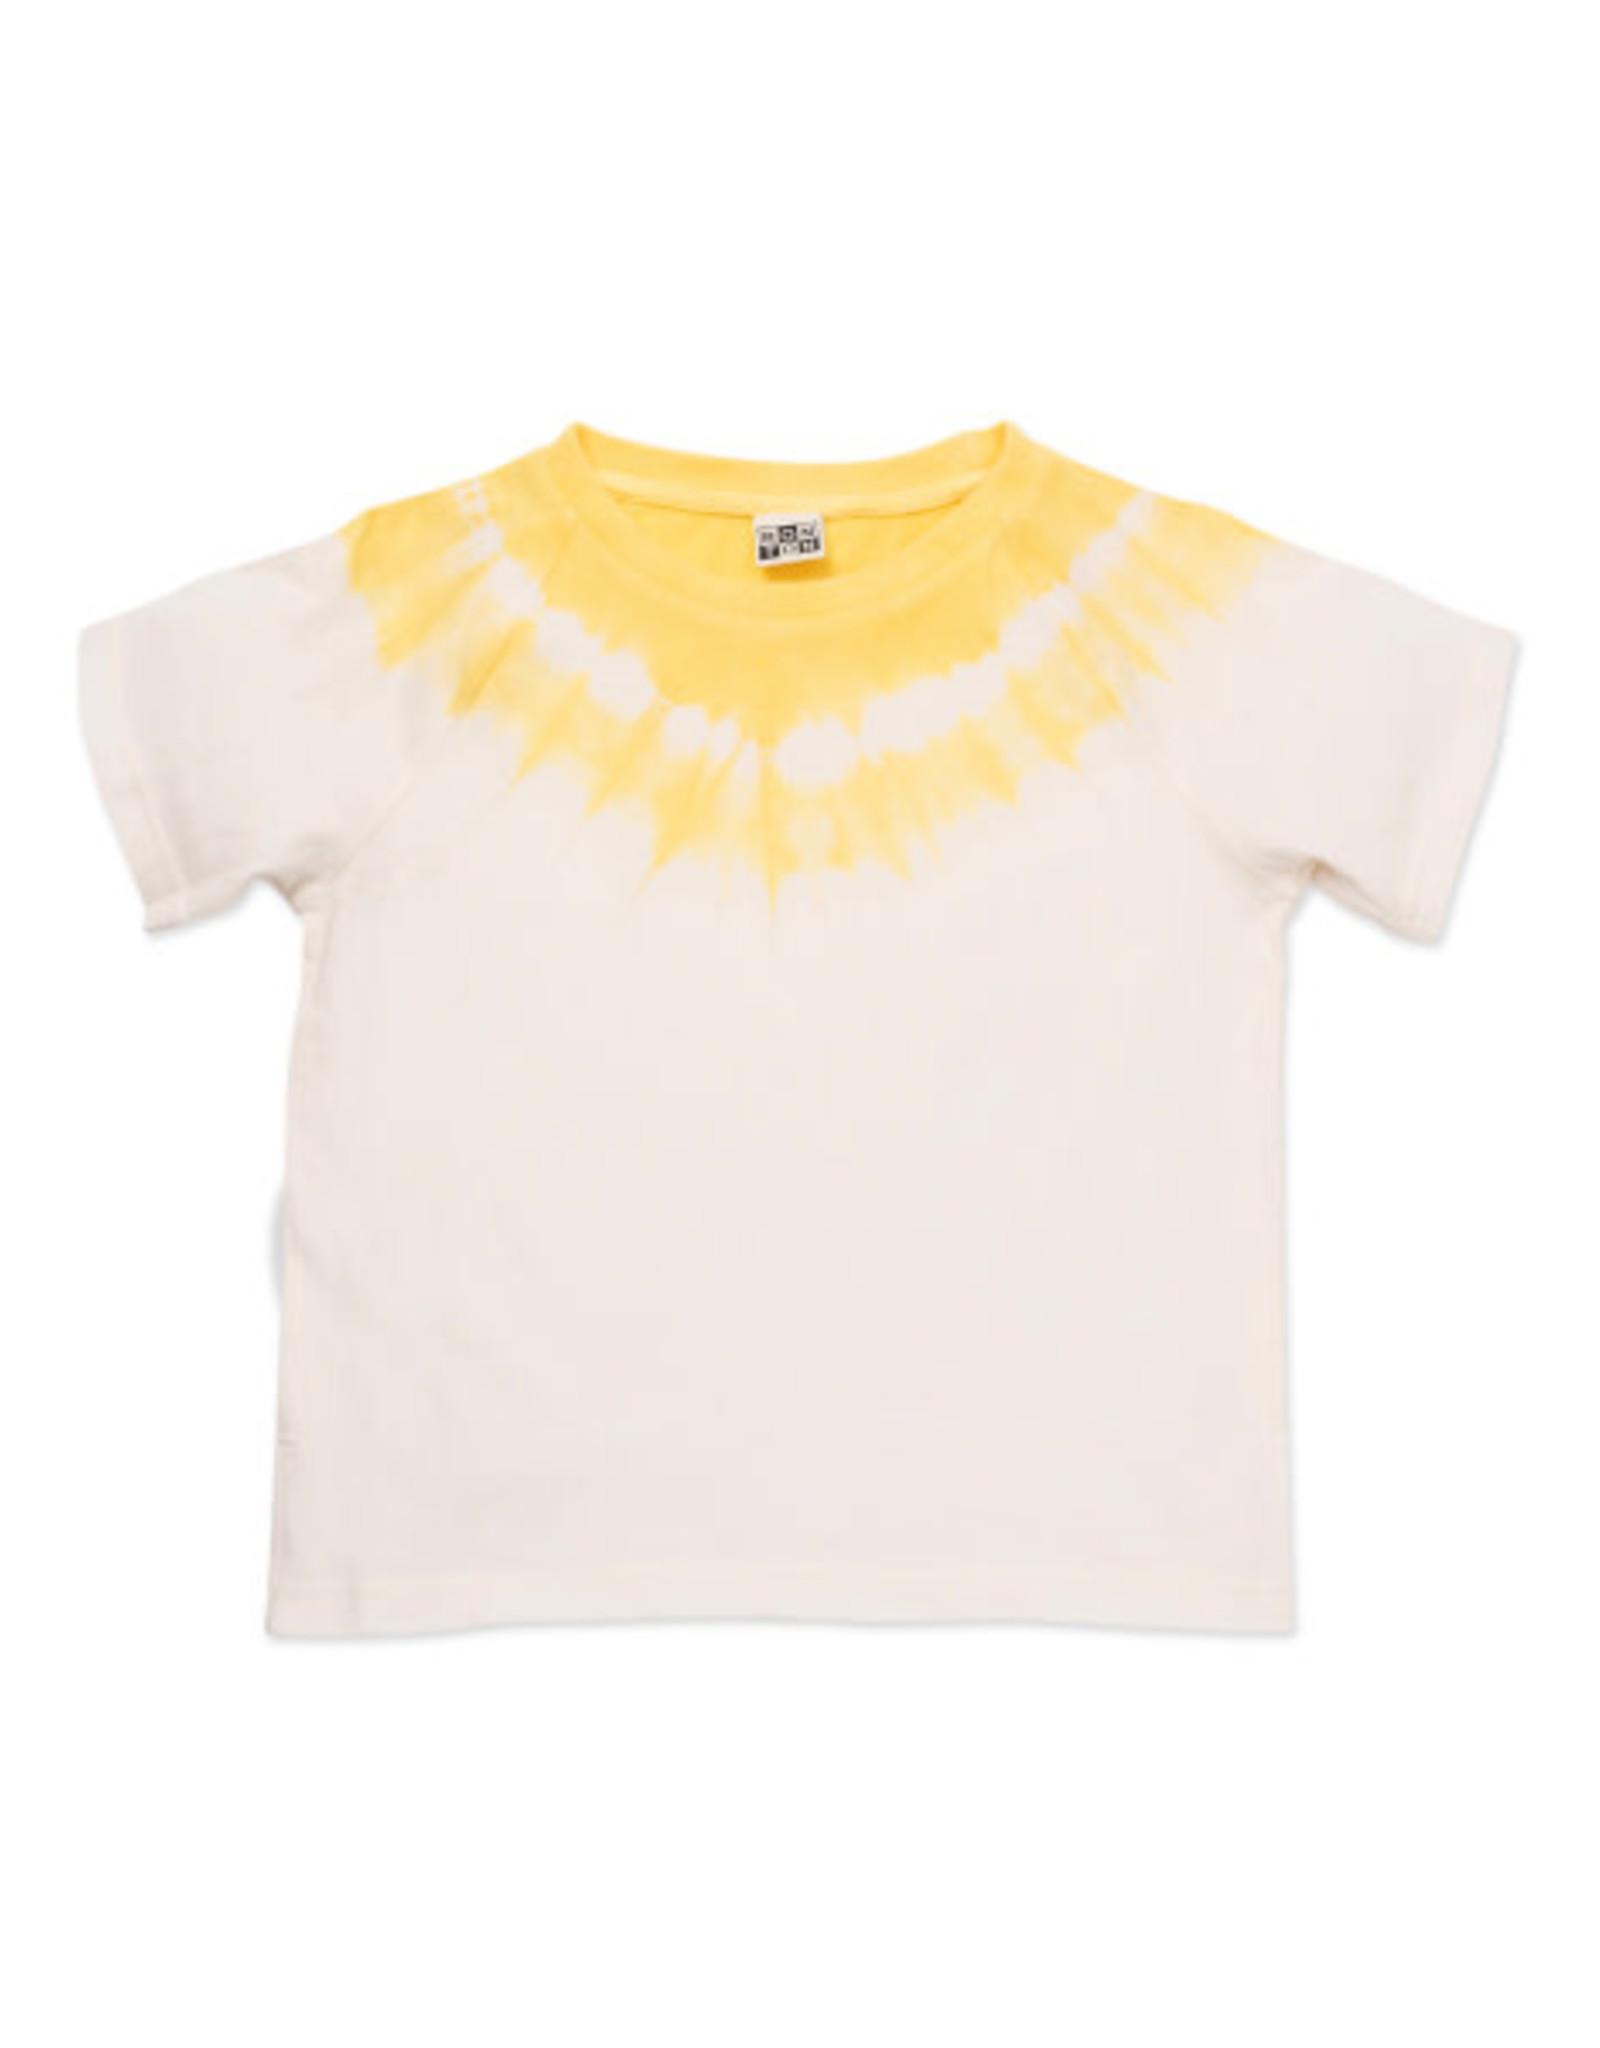 Bonton SS21 Dyetshirt coco yellow